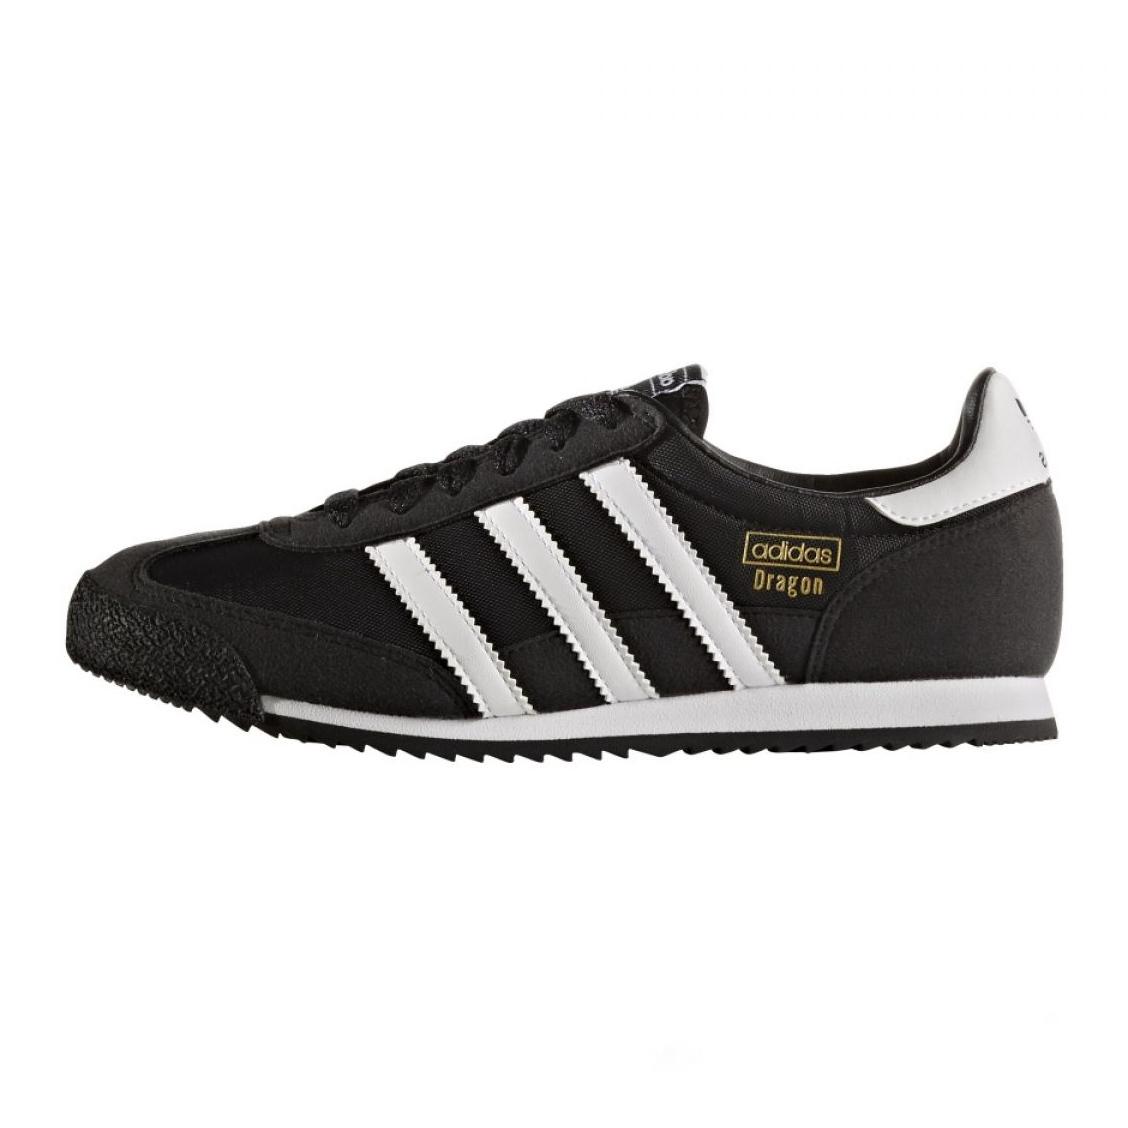 Adidas Originals Dragon Og Jr BB2487 cipő fekete